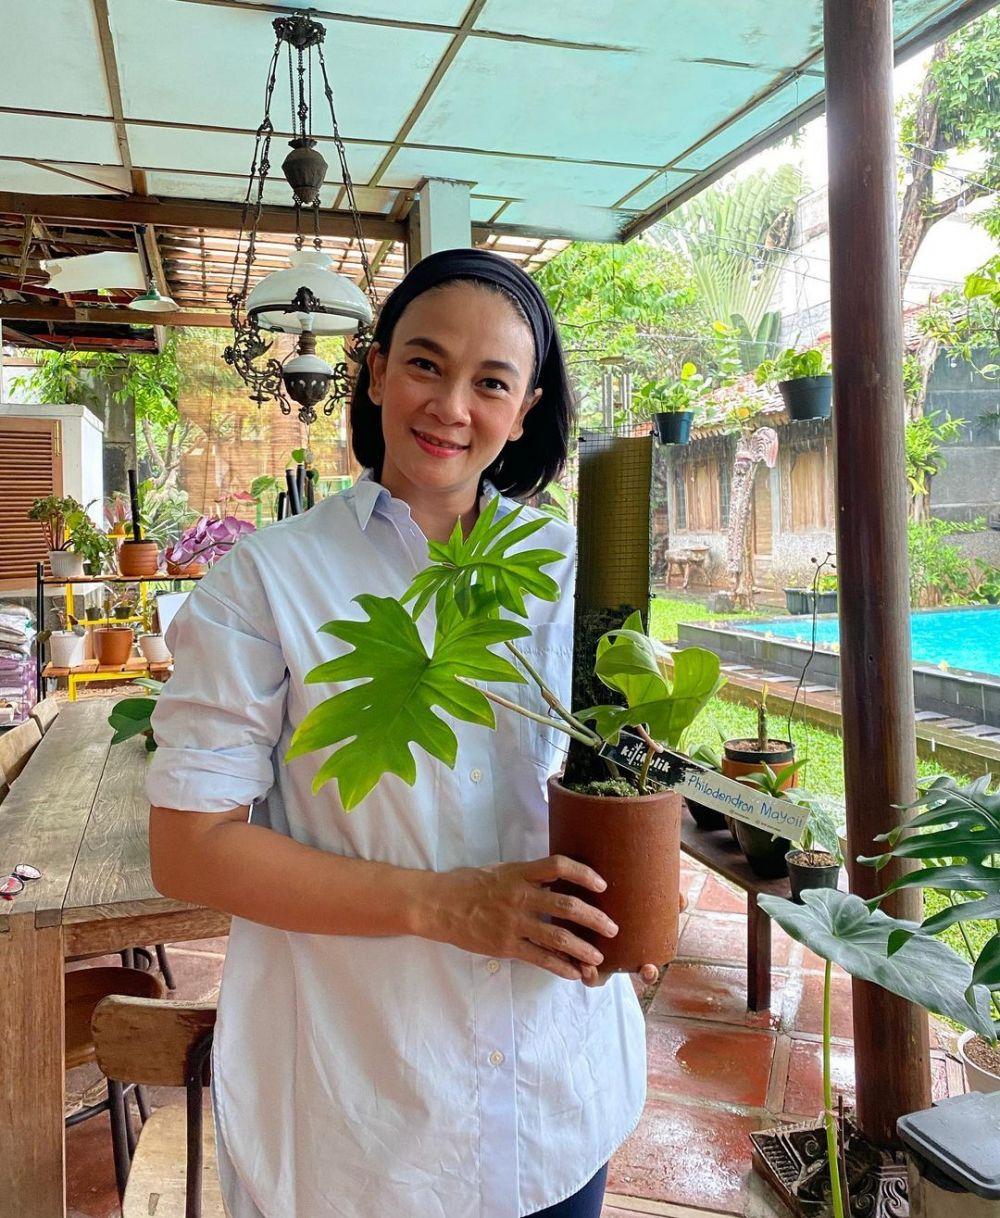 Potret koleksi tanaman Dian Nitami Instagram